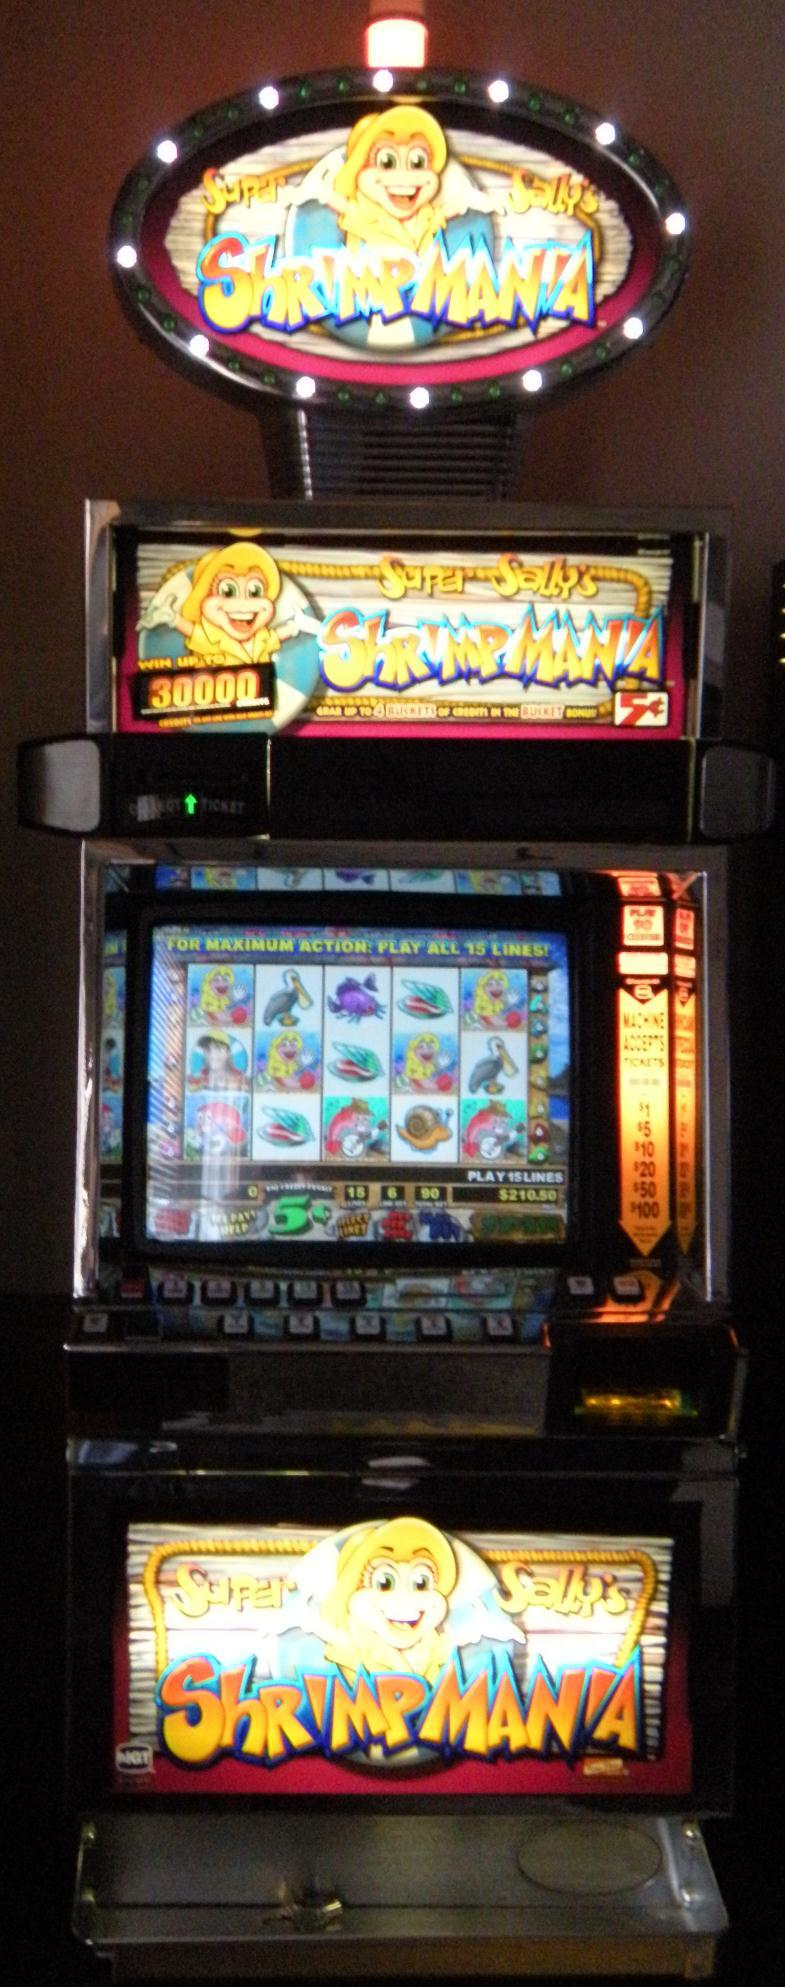 Shrimp mania slot machine online voulgaris poker wiki